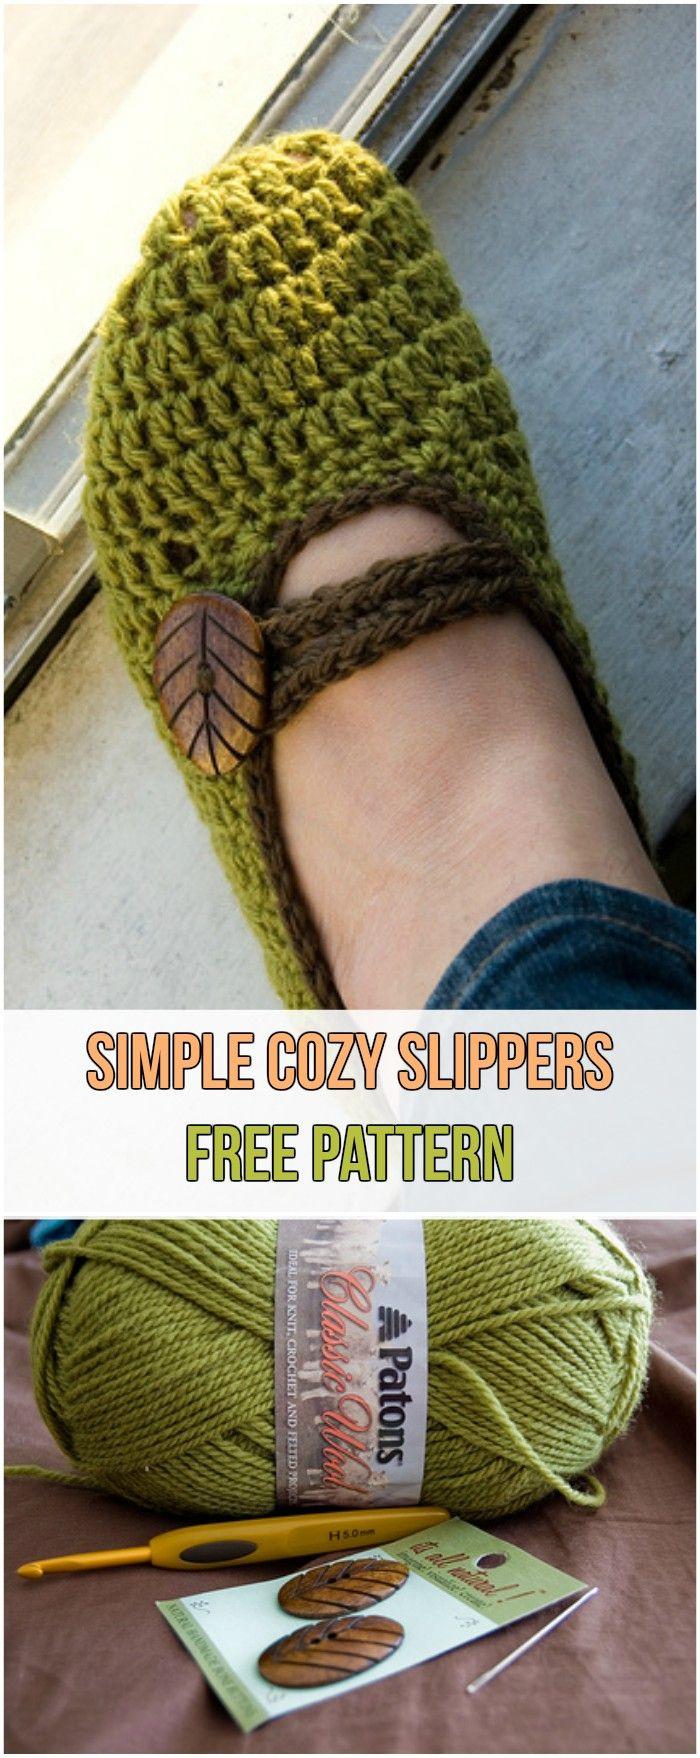 7 Easy Crochet Slippers Free Patterns | Pinterest | Hausschuhe ...